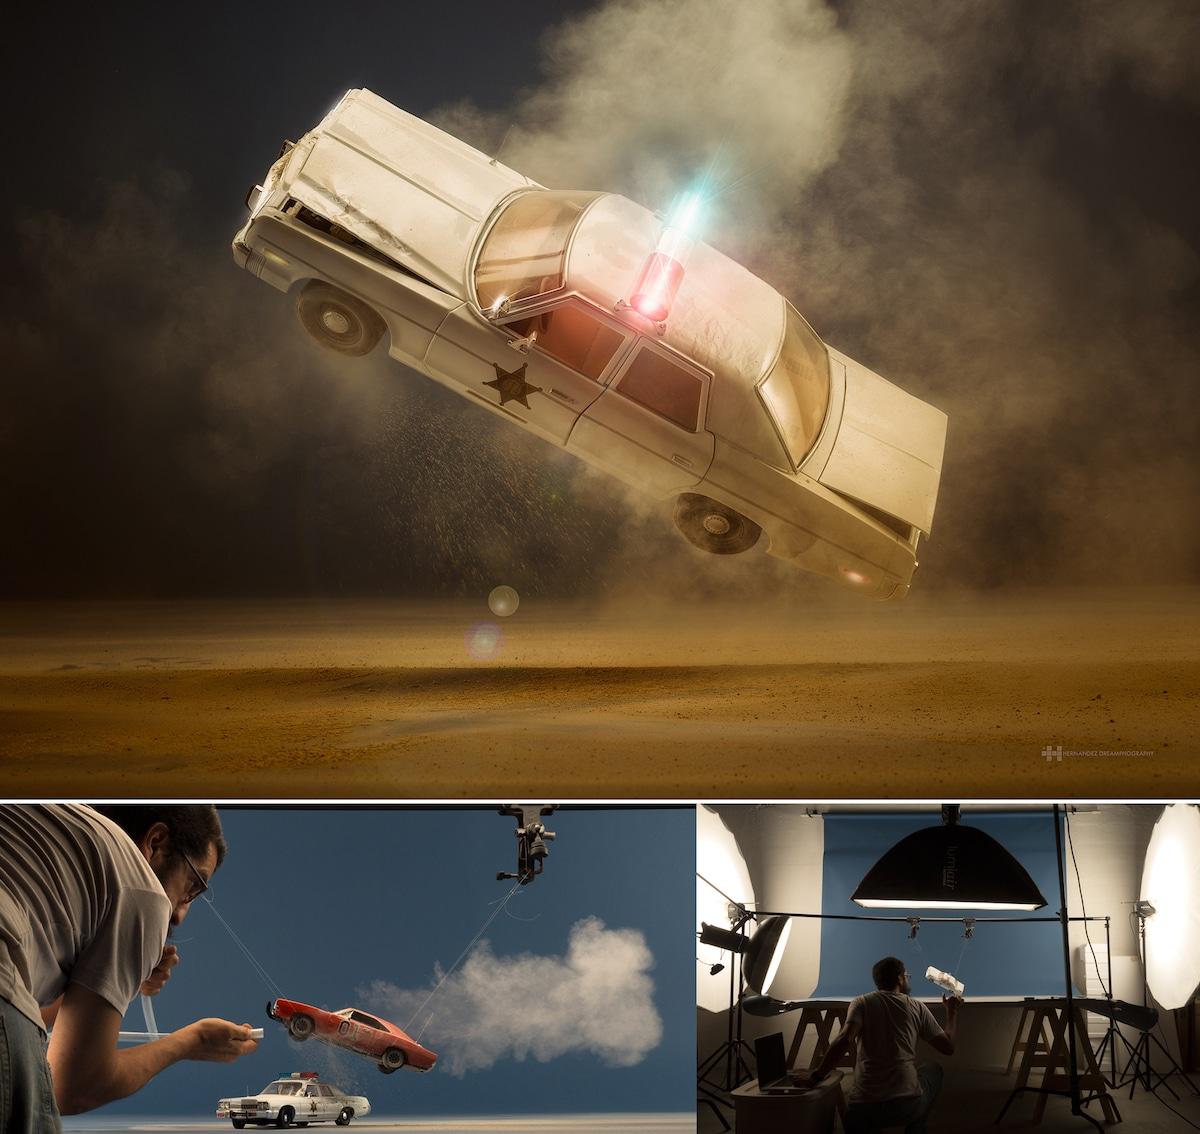 Miniature Scenes Digital Art Photography by Felix Hernandez